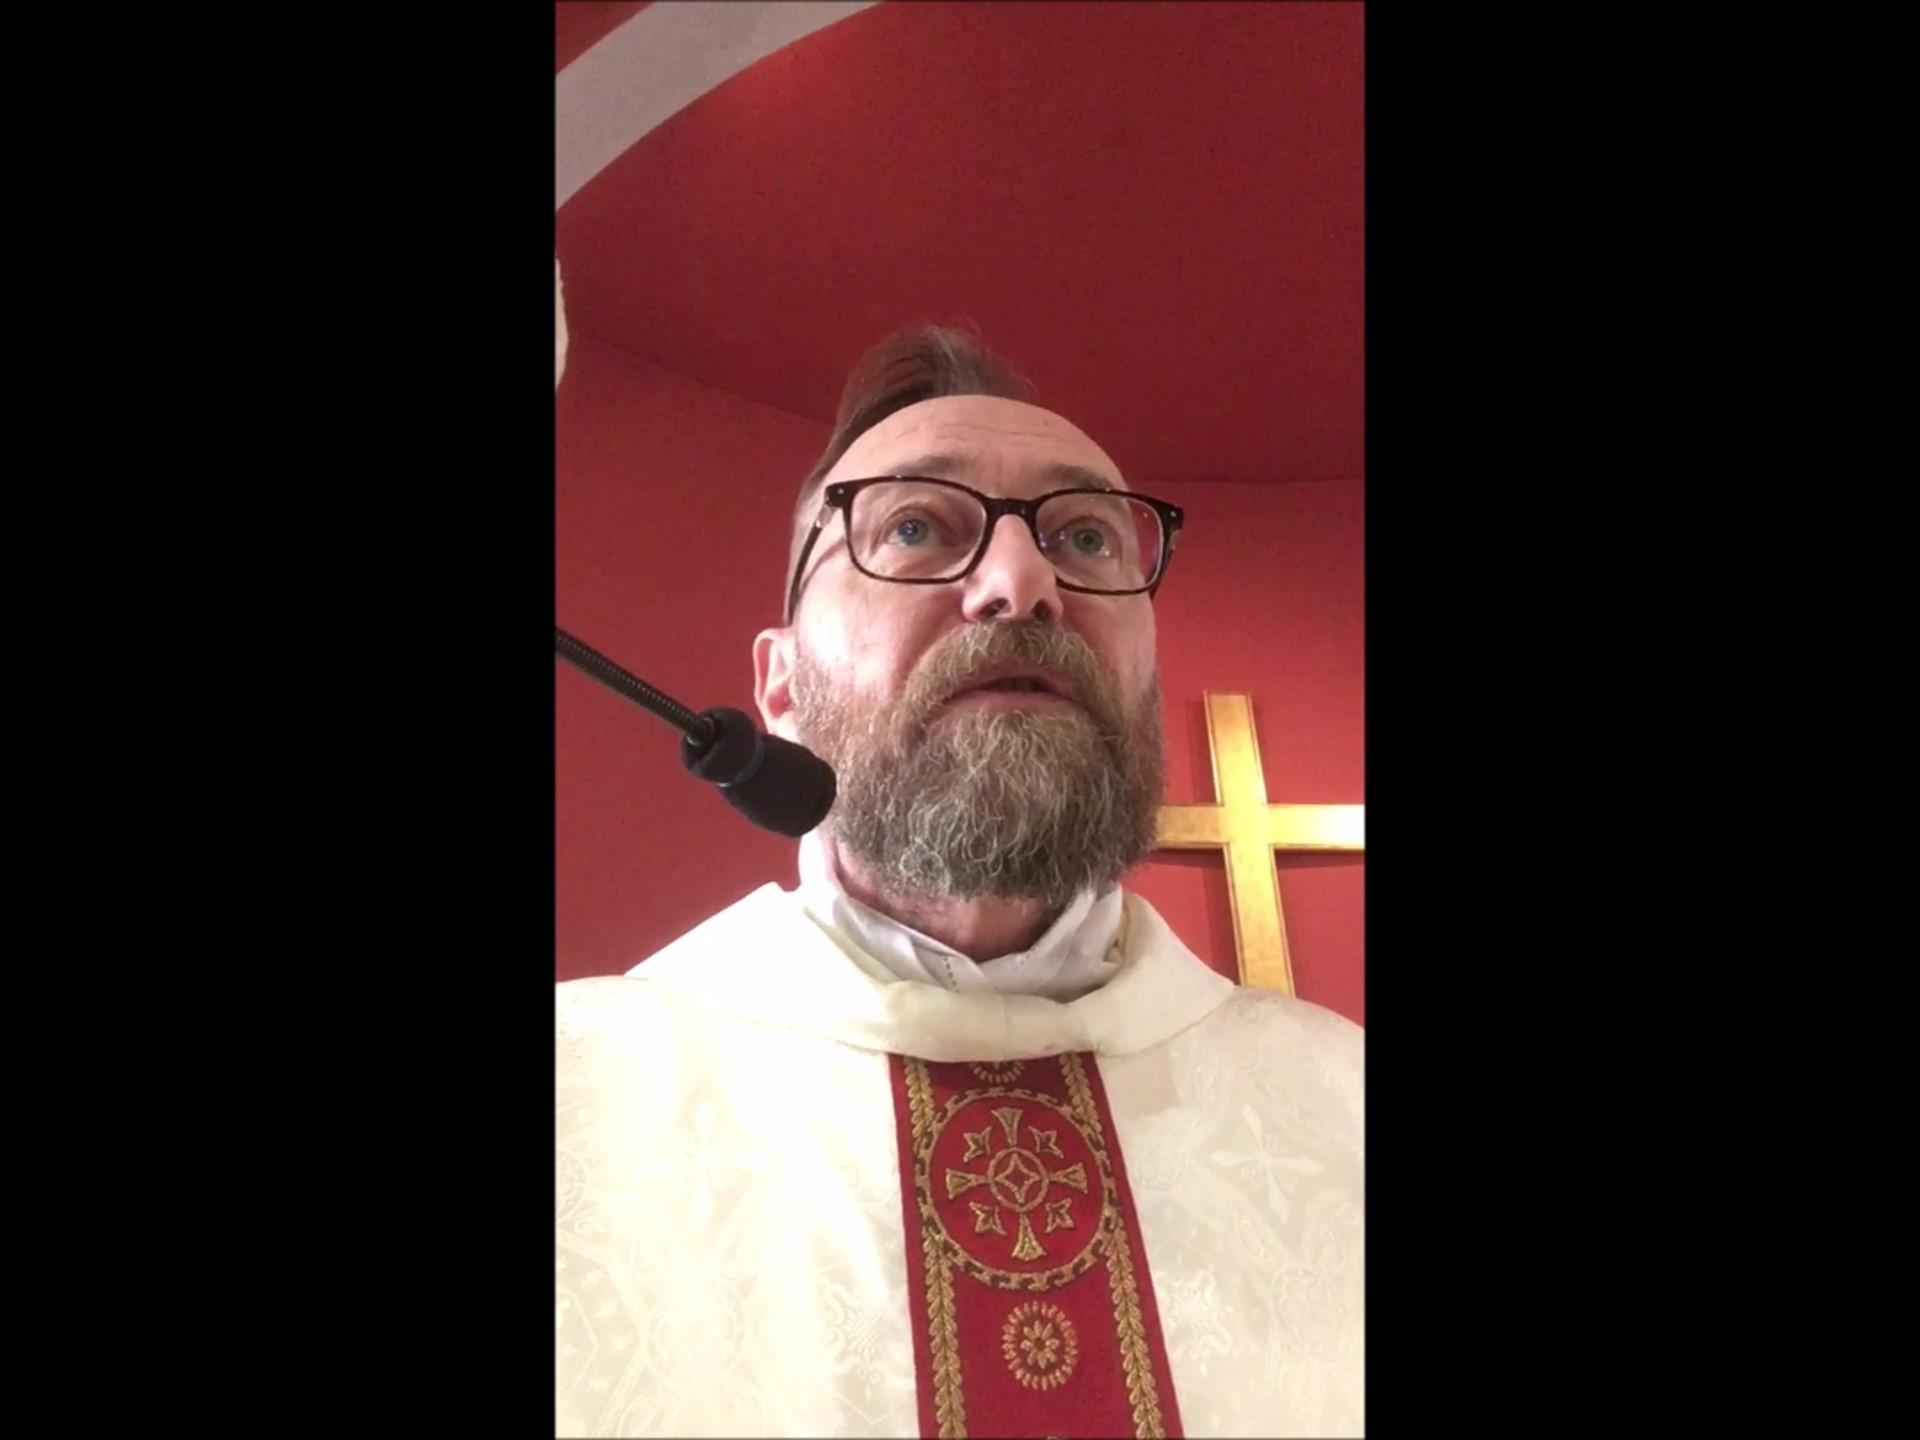 Jeudi-Saint 2020 - Père Bernard MAITTE le 9 avril 2020